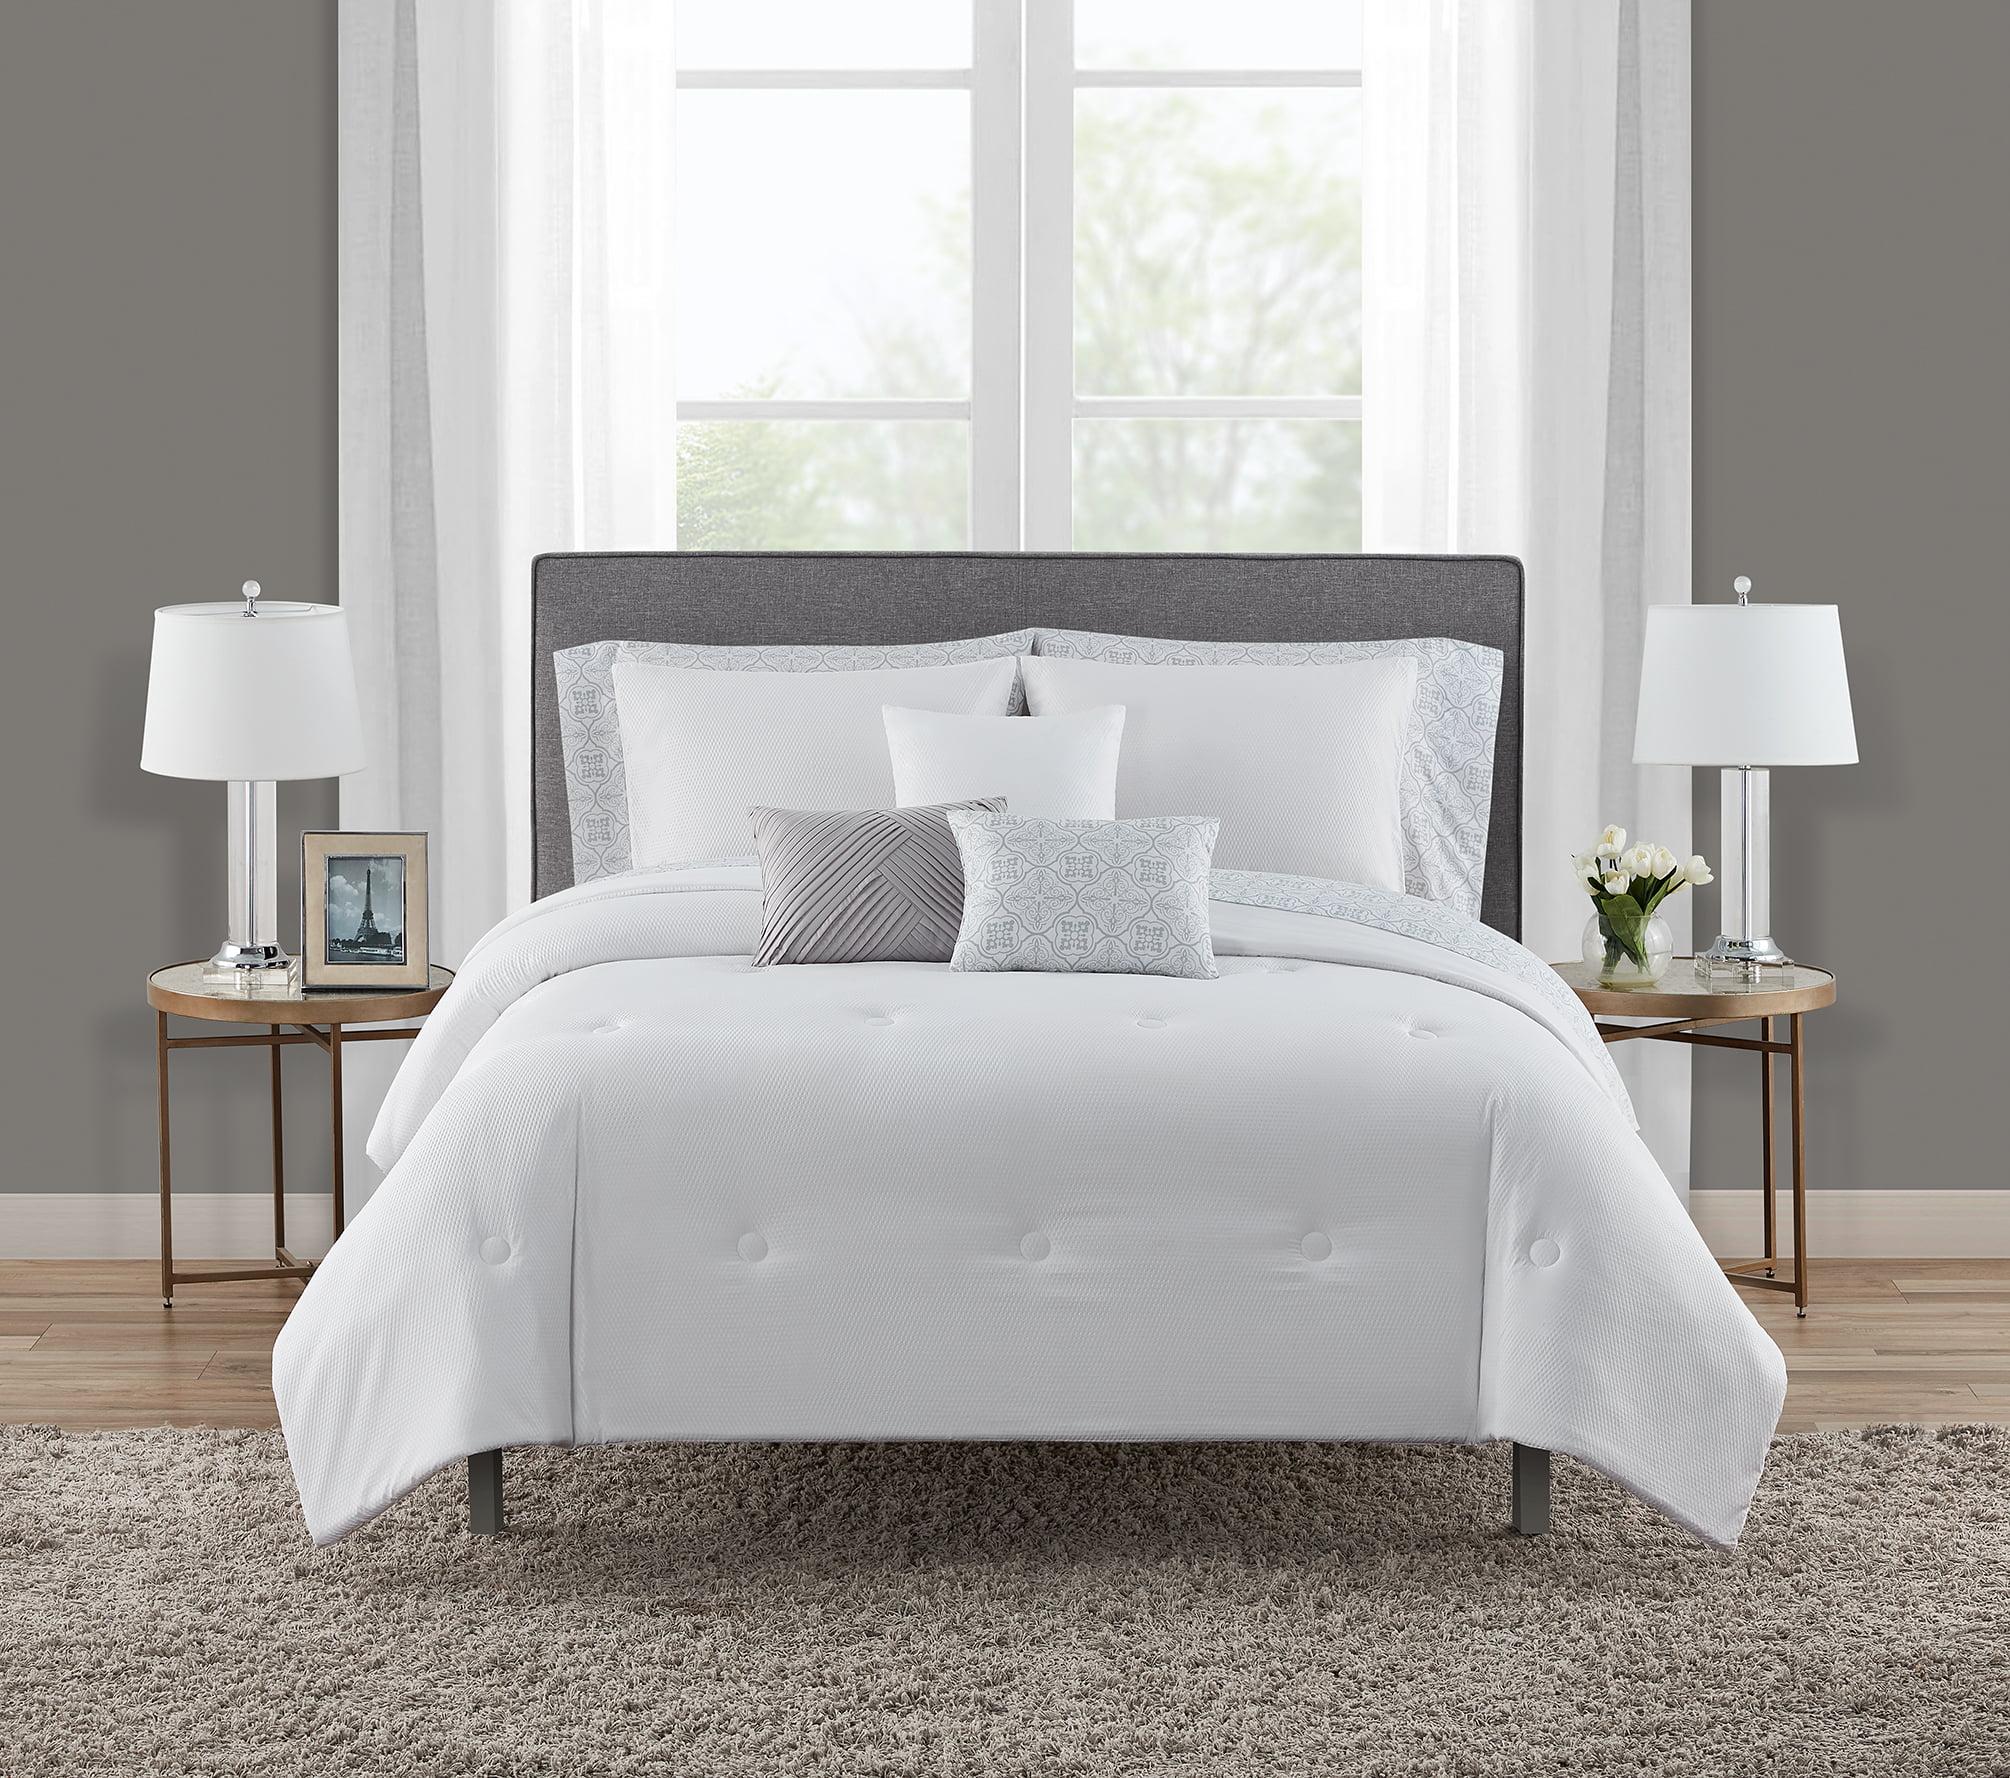 Mainstays White Puffy 10 Piece Bed In A Bag Bedding Set With Bonus Sheet Set Pillows Full Walmart Com Walmart Com